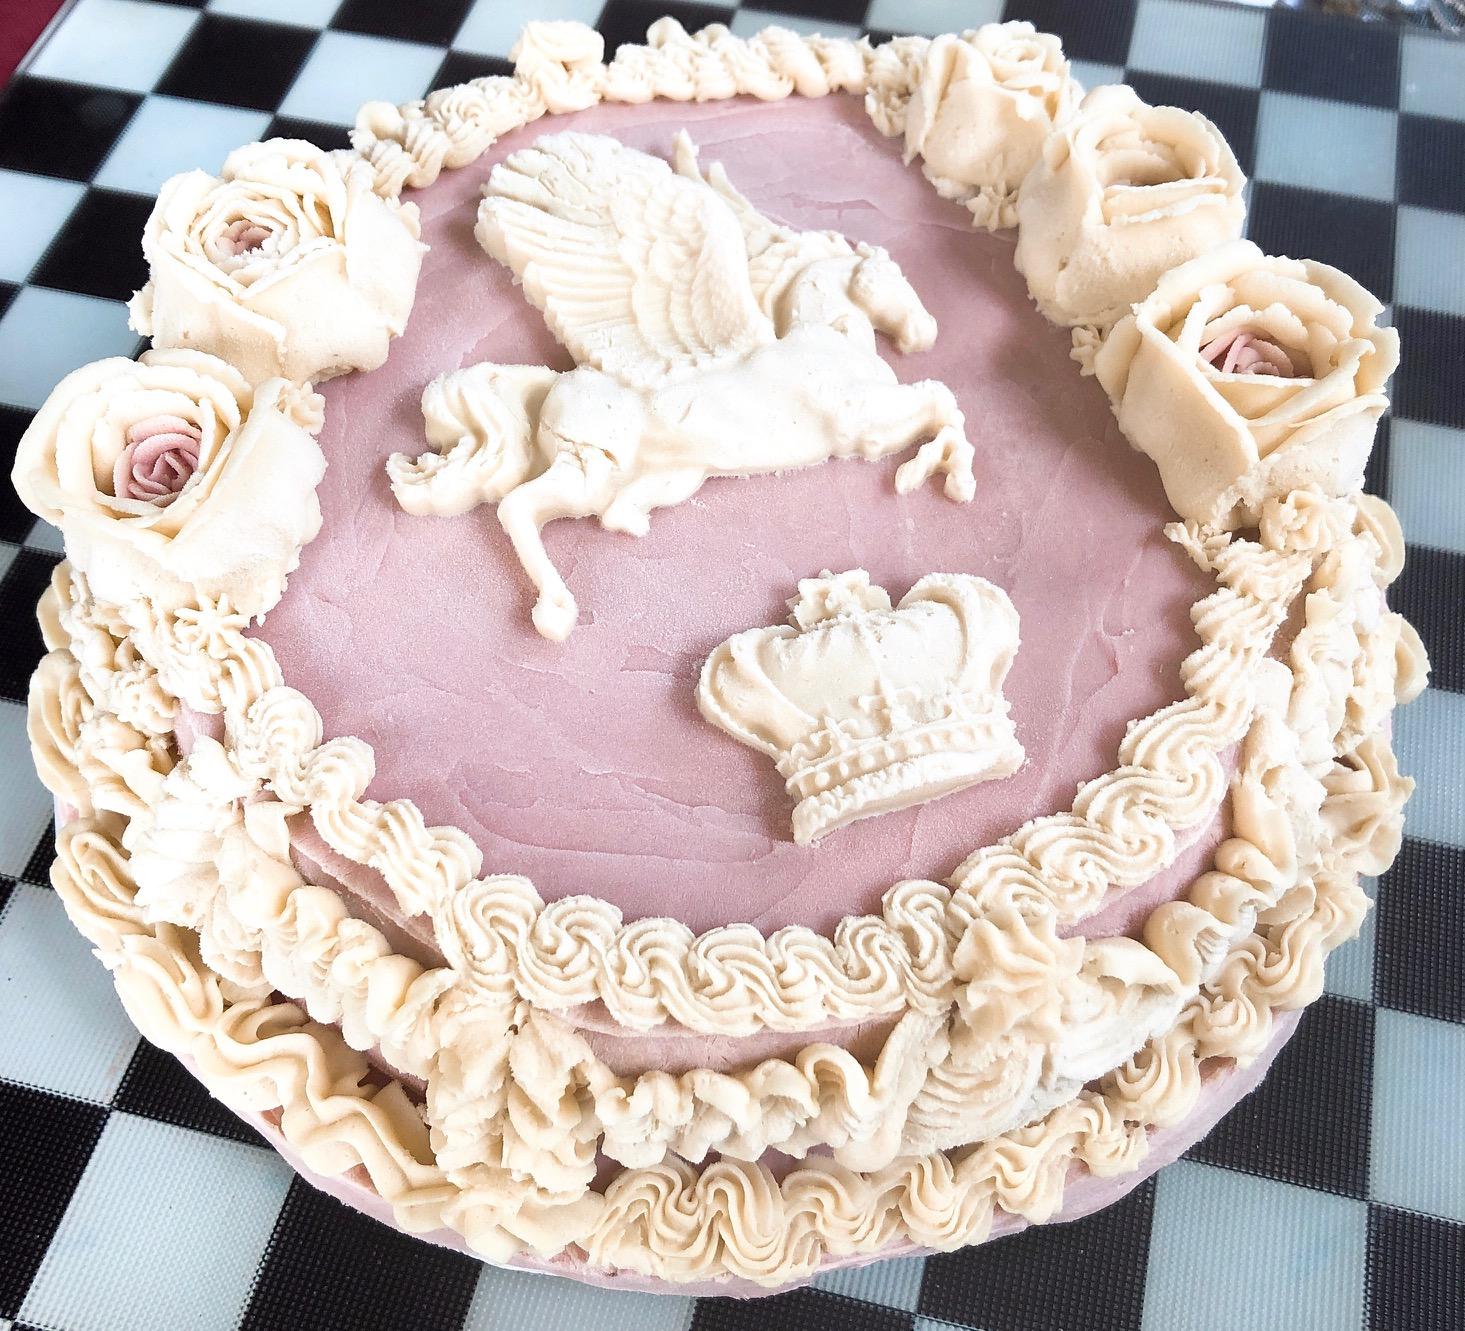 ≪Raw&ヴィーガン ロココ調フラワーケーキ≫幸運/Bon Chance(ボンシャンス) カシス&ピスタチオ&チョコレート味 18cmホール